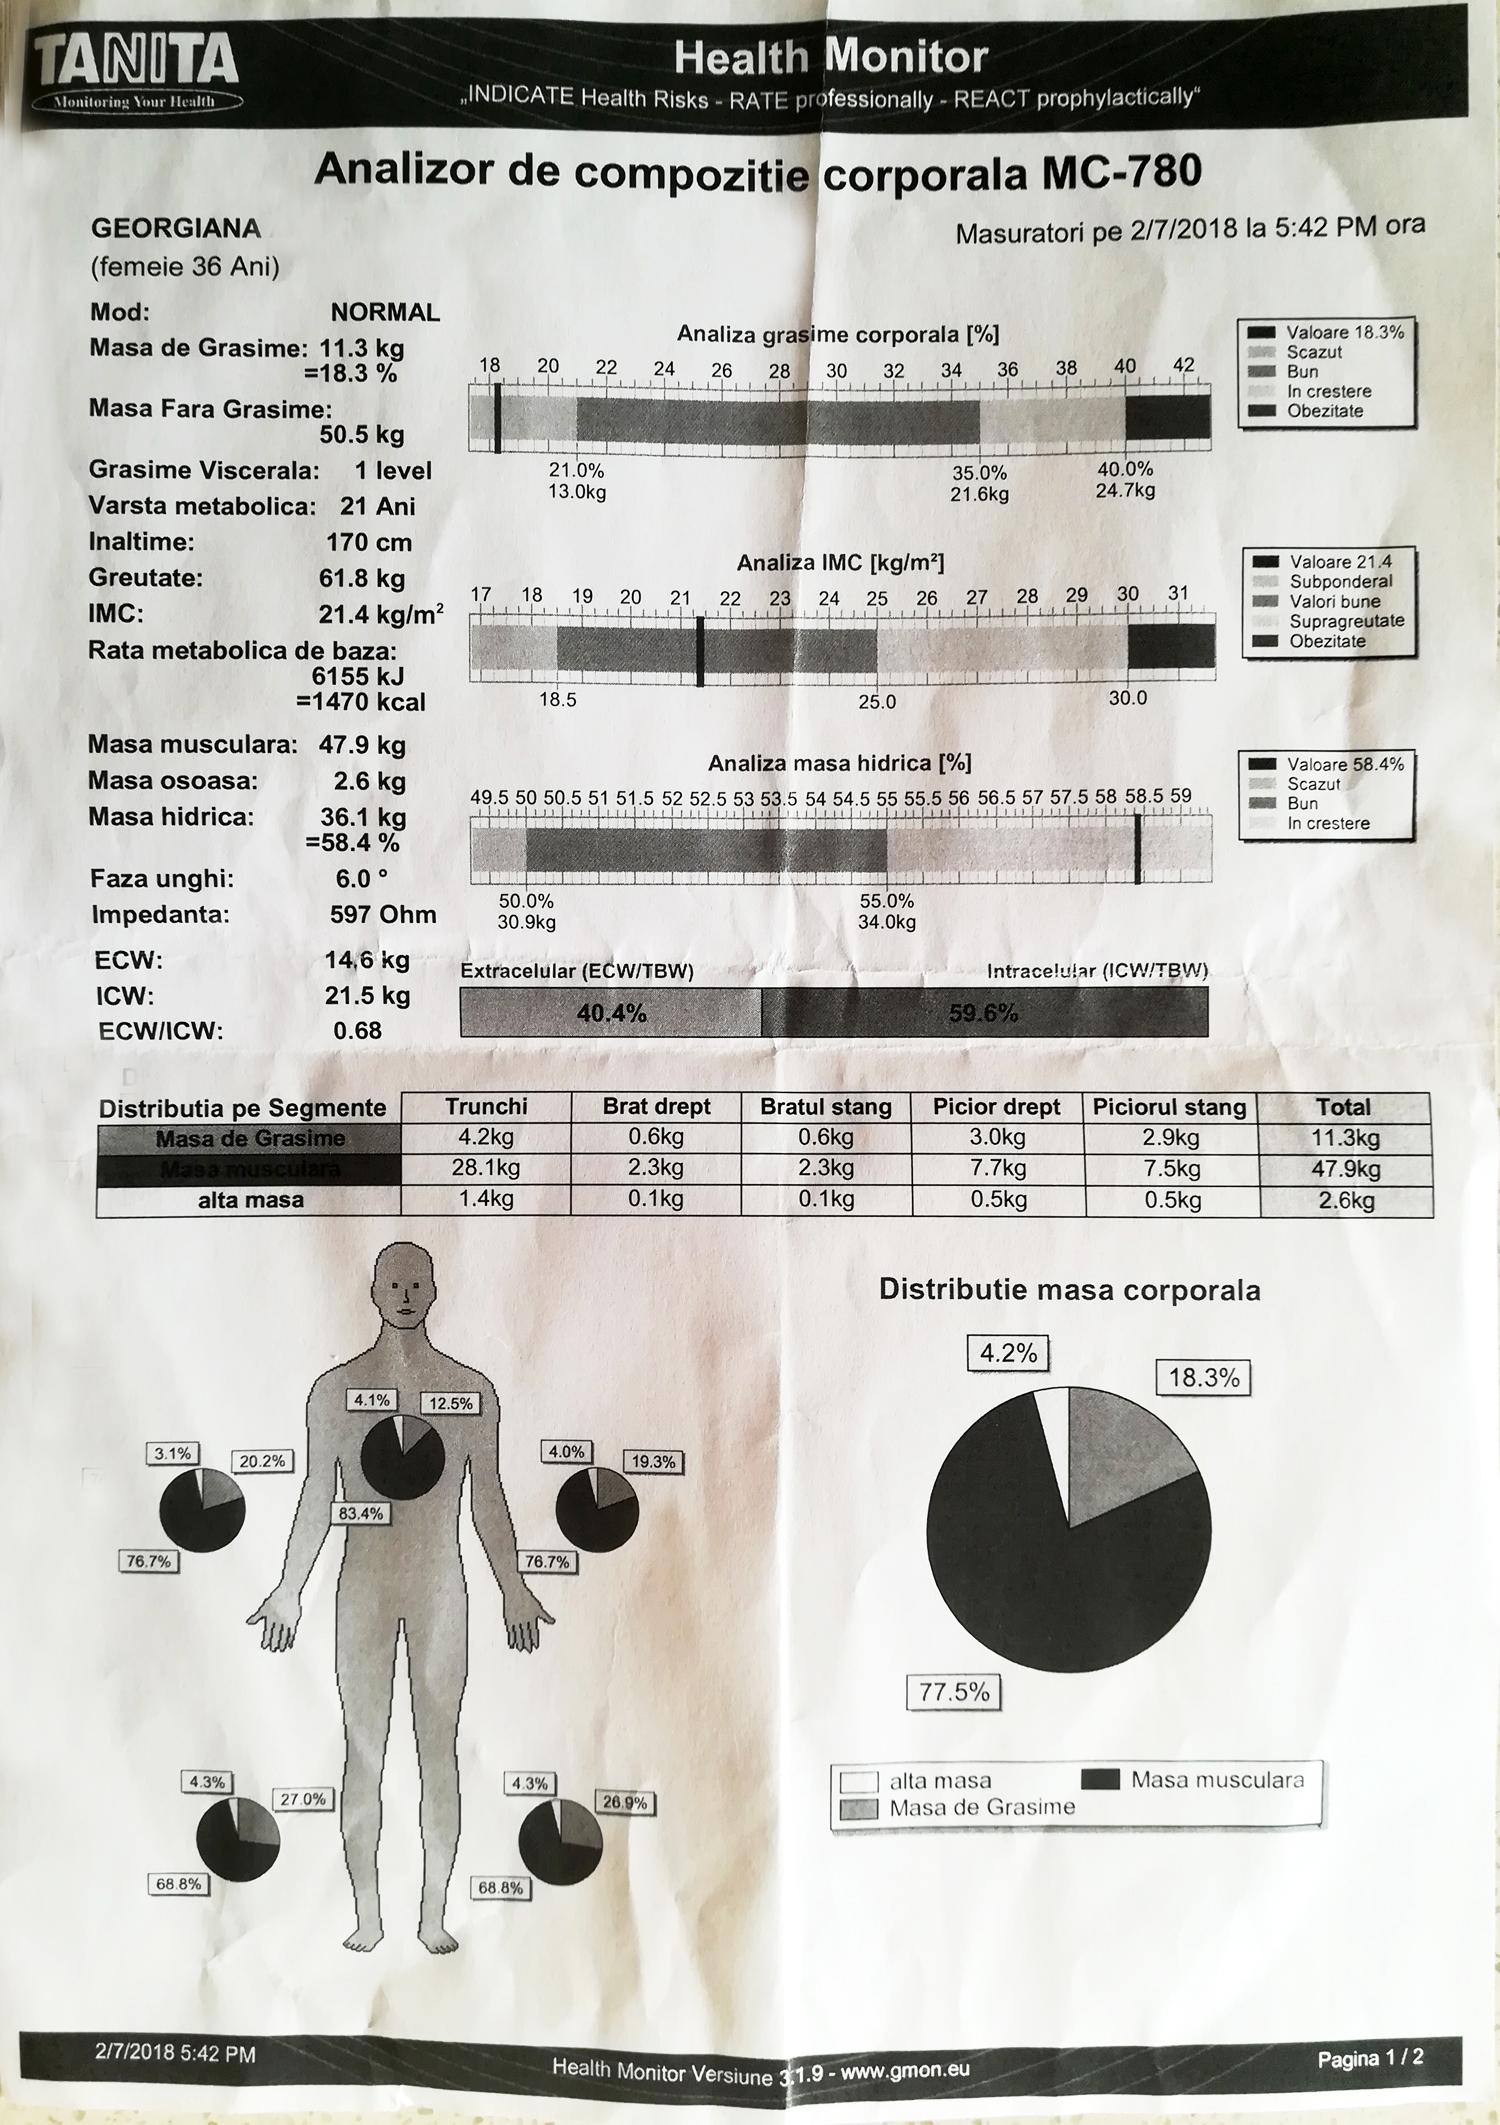 assessment Tanita Body Analizer MC-780